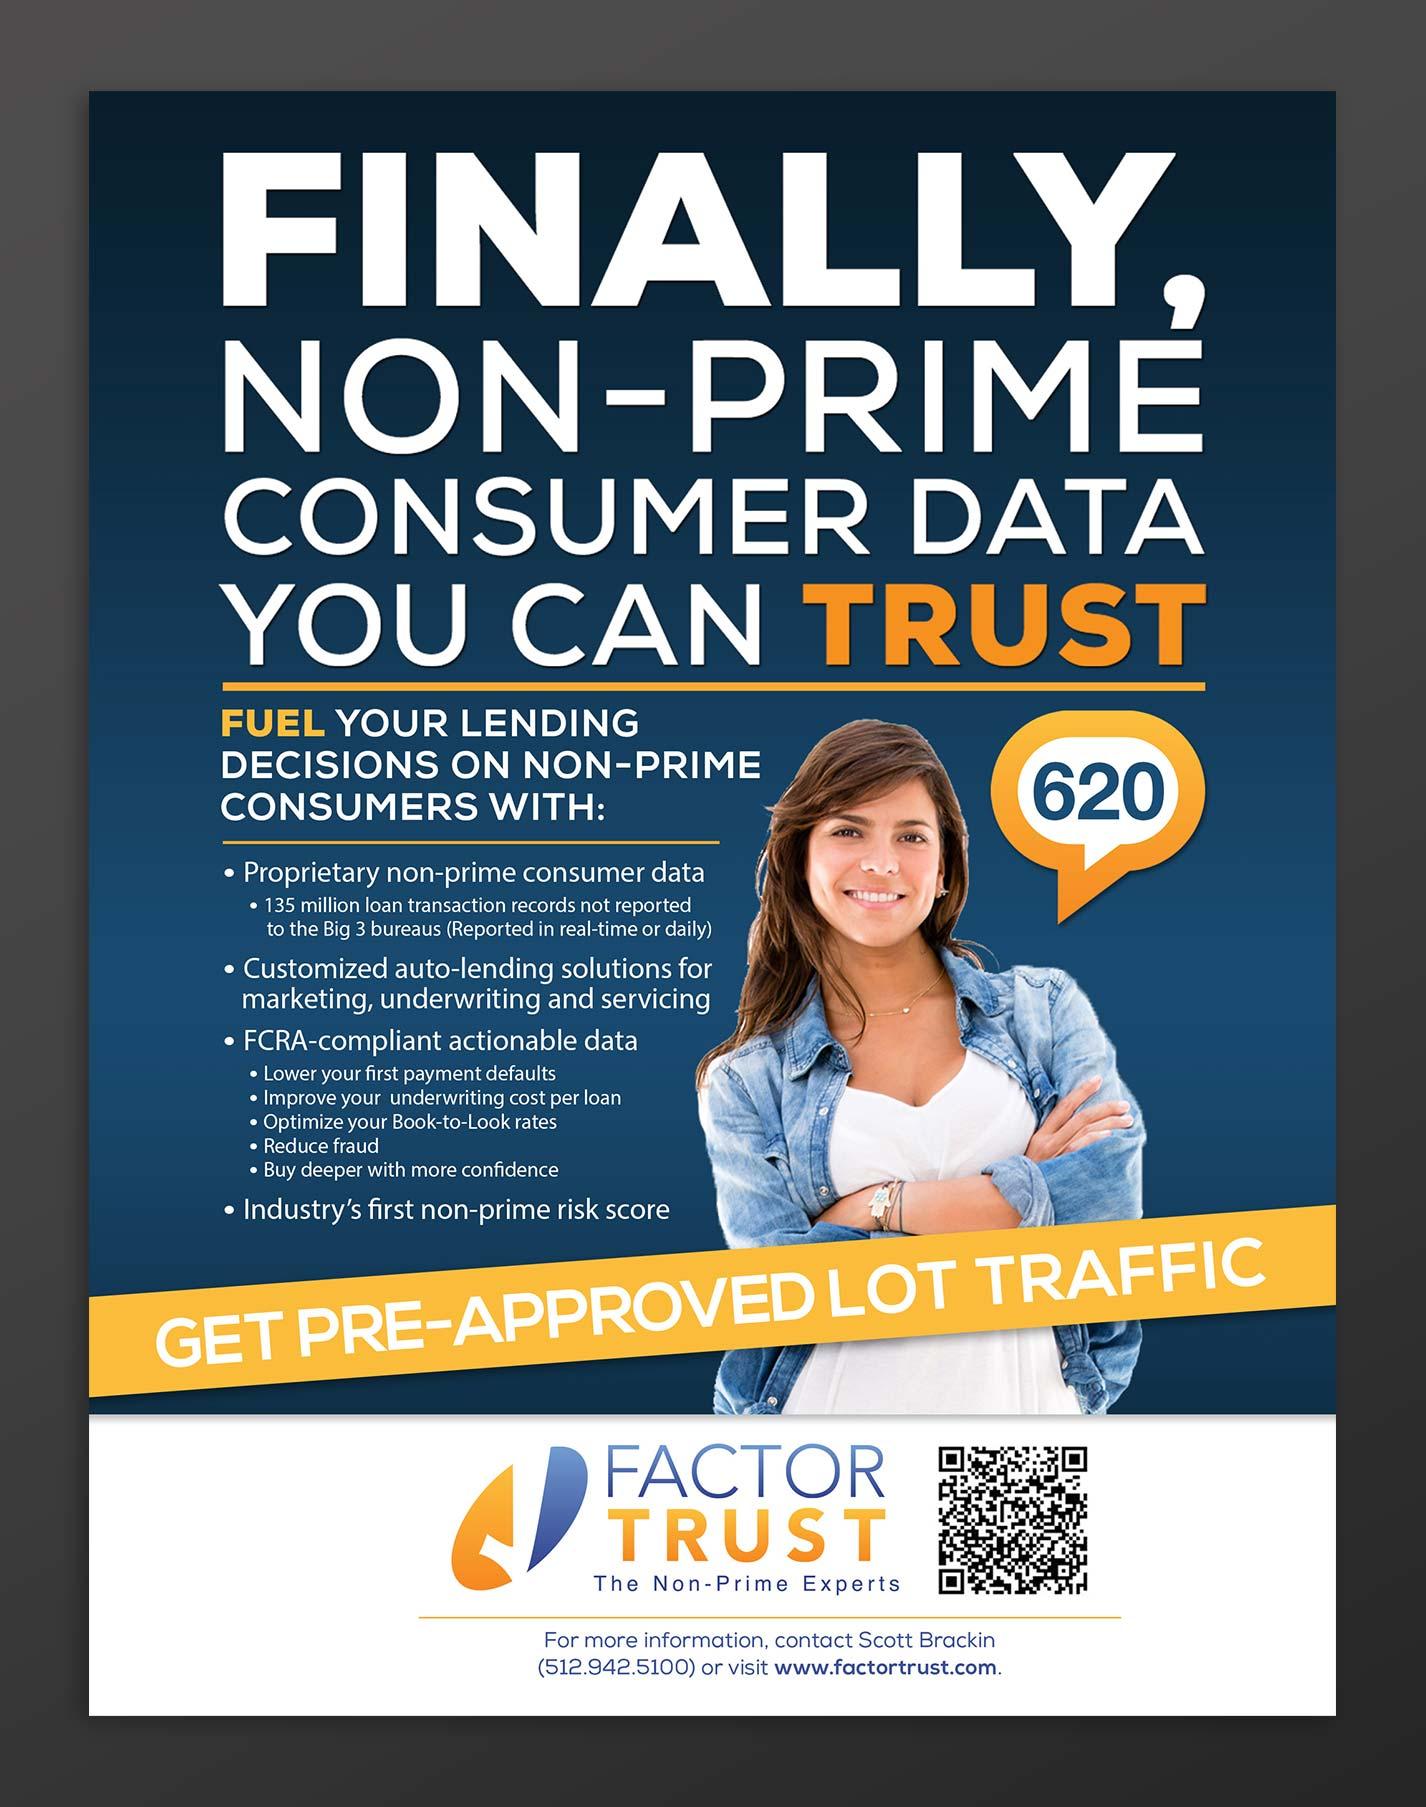 factortrust-01